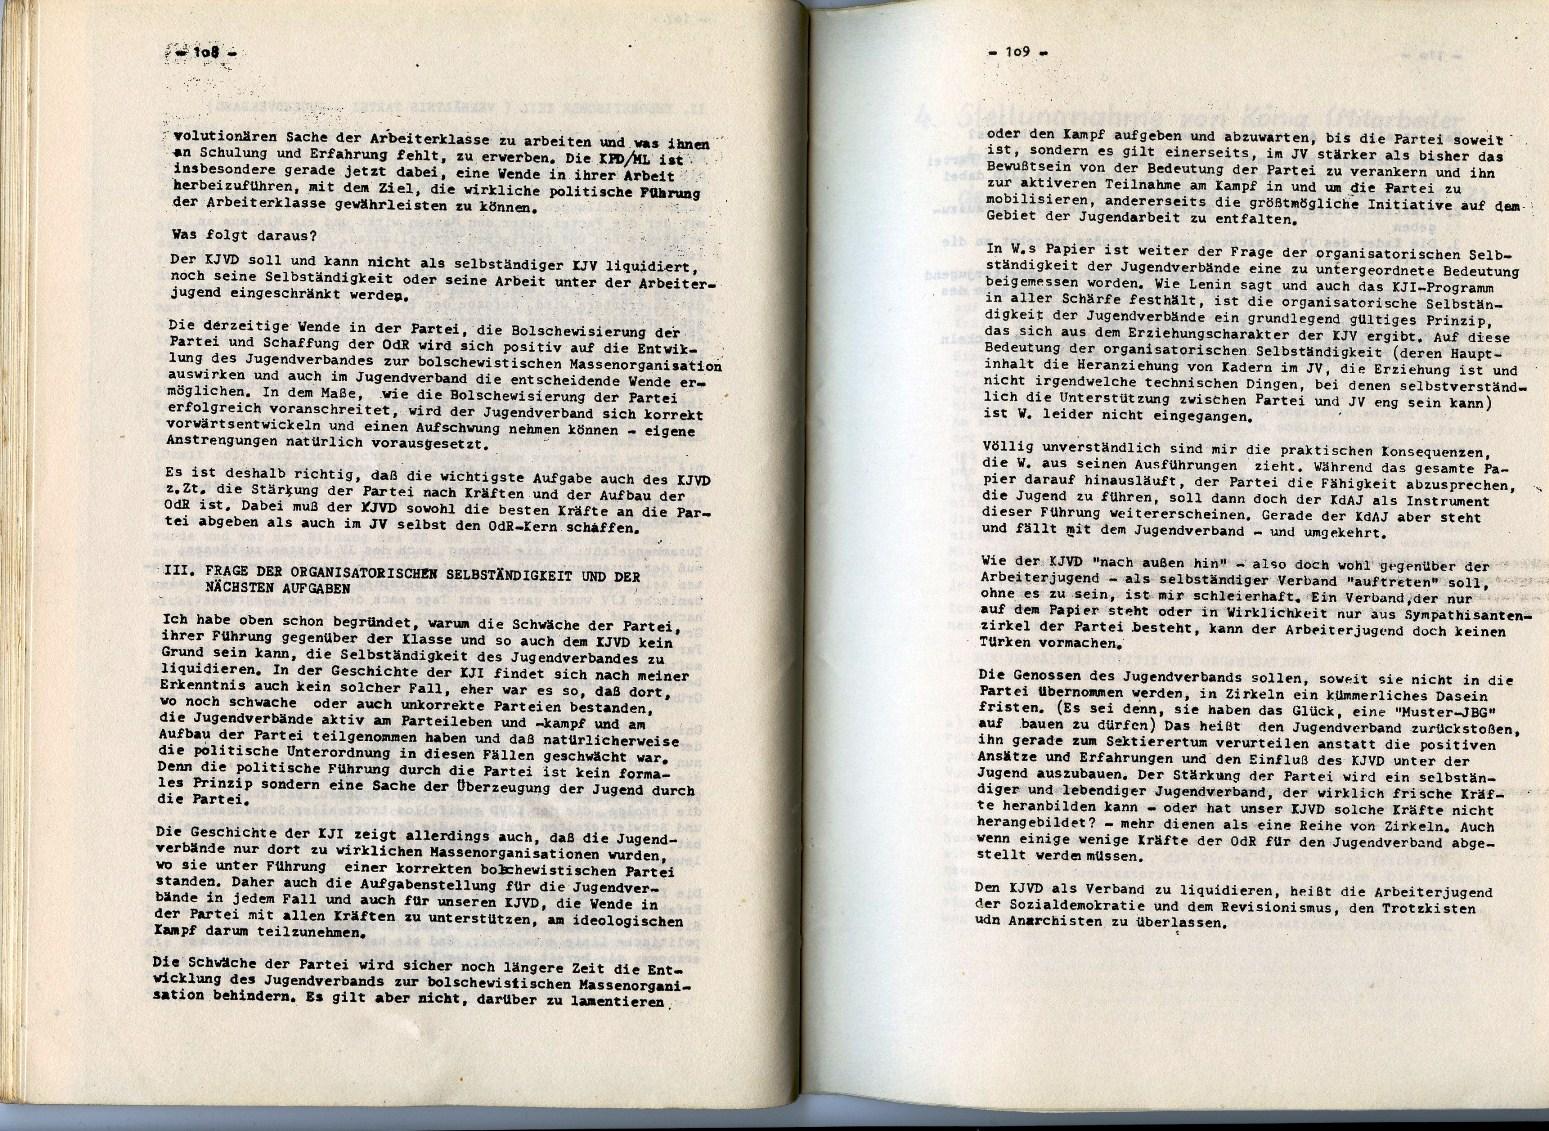 ZB_Universitas_1972_58